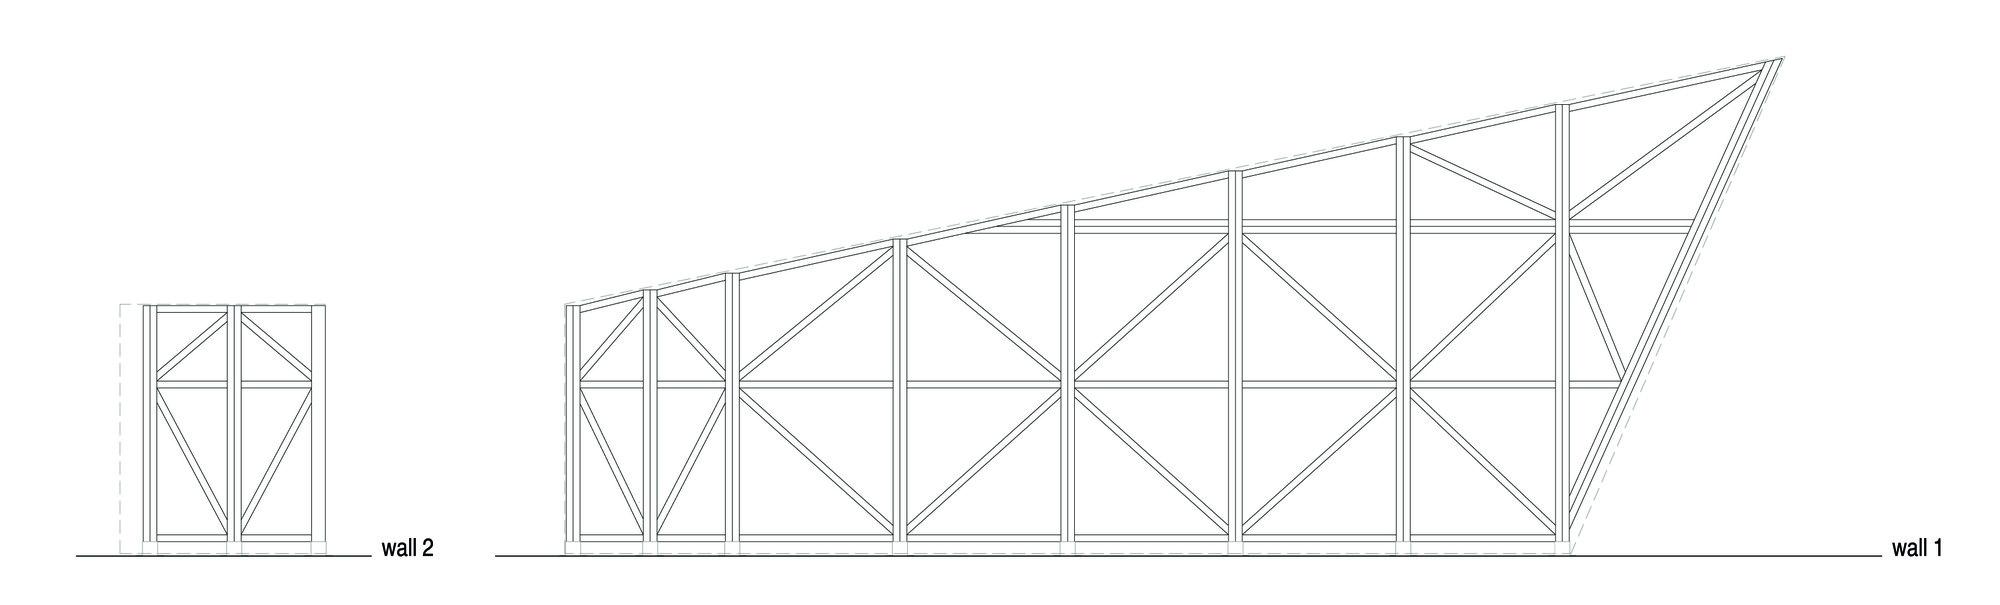 Light Lab 5.1 / VaV Architects